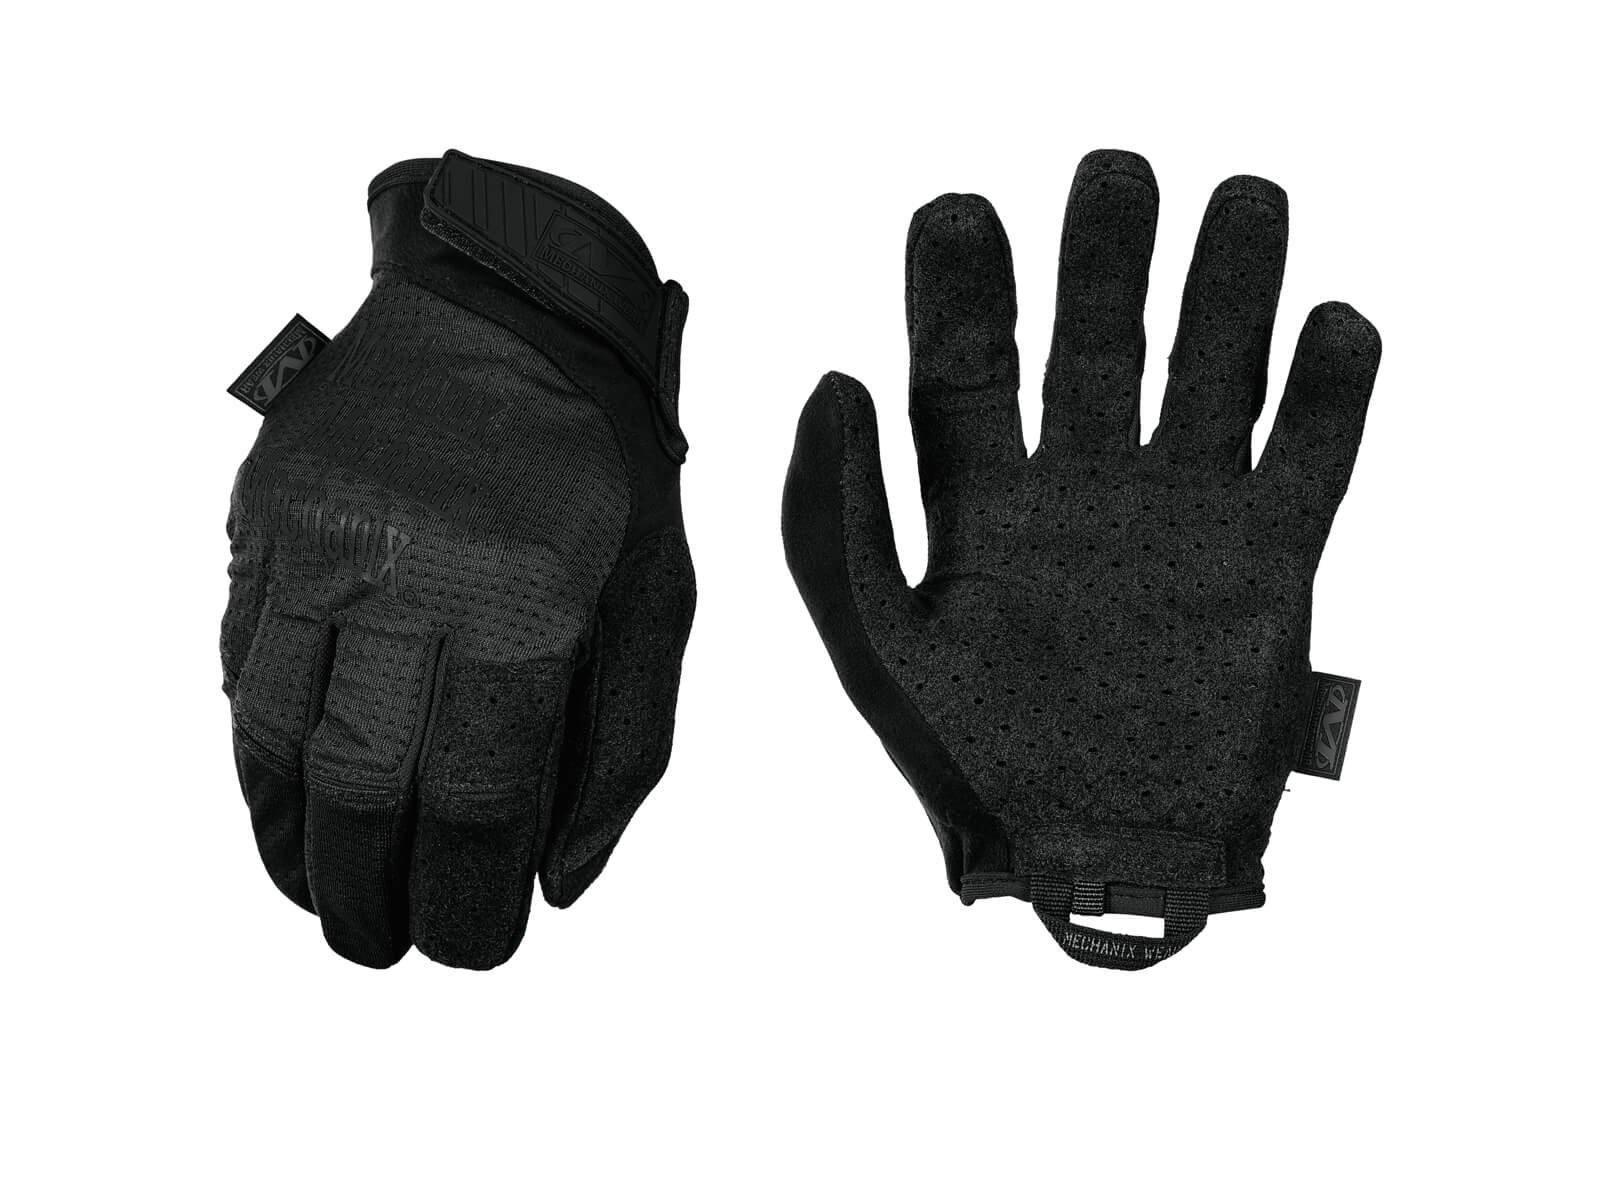 Mechanix handske Speciality Vent, Sort